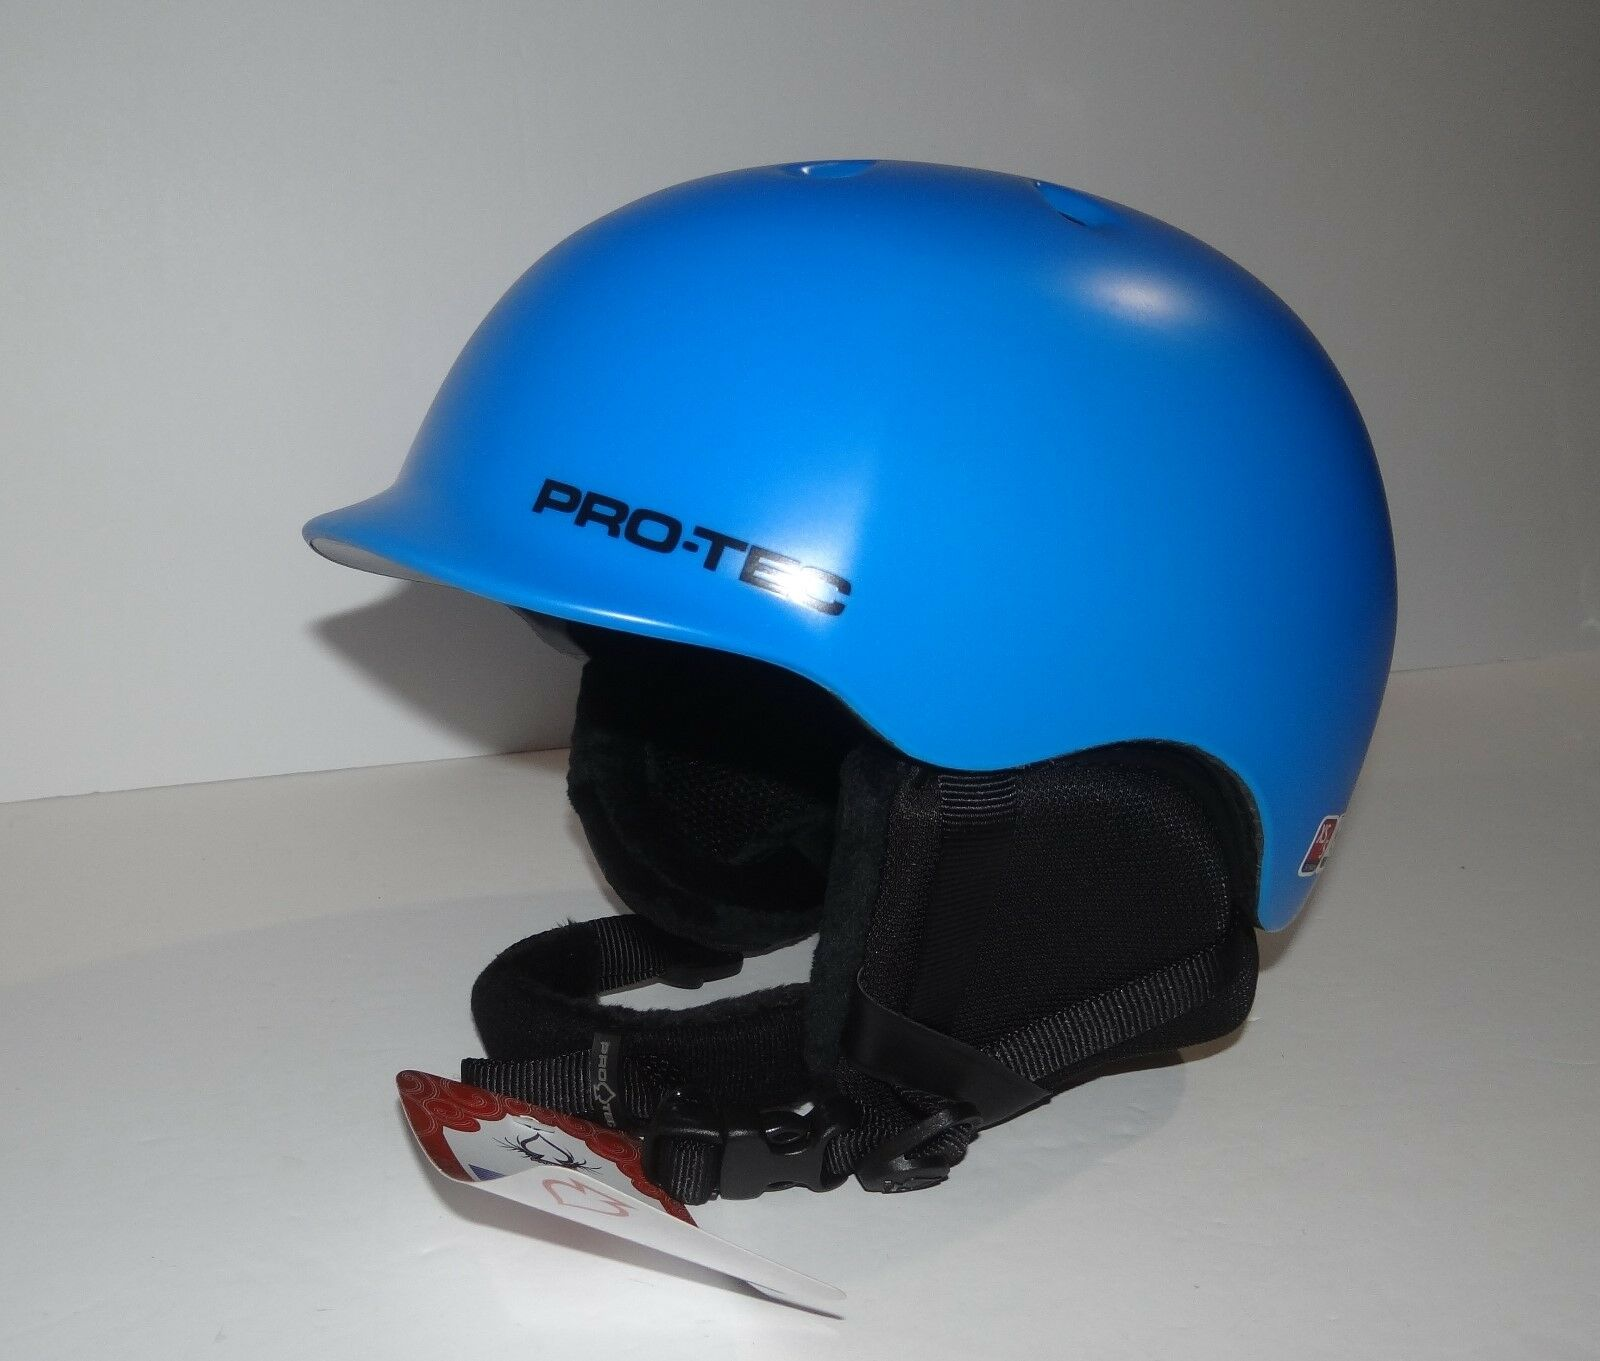 New Pro-Tec Riot Ski Snowboard Helmet XS / S 51cm-54cm